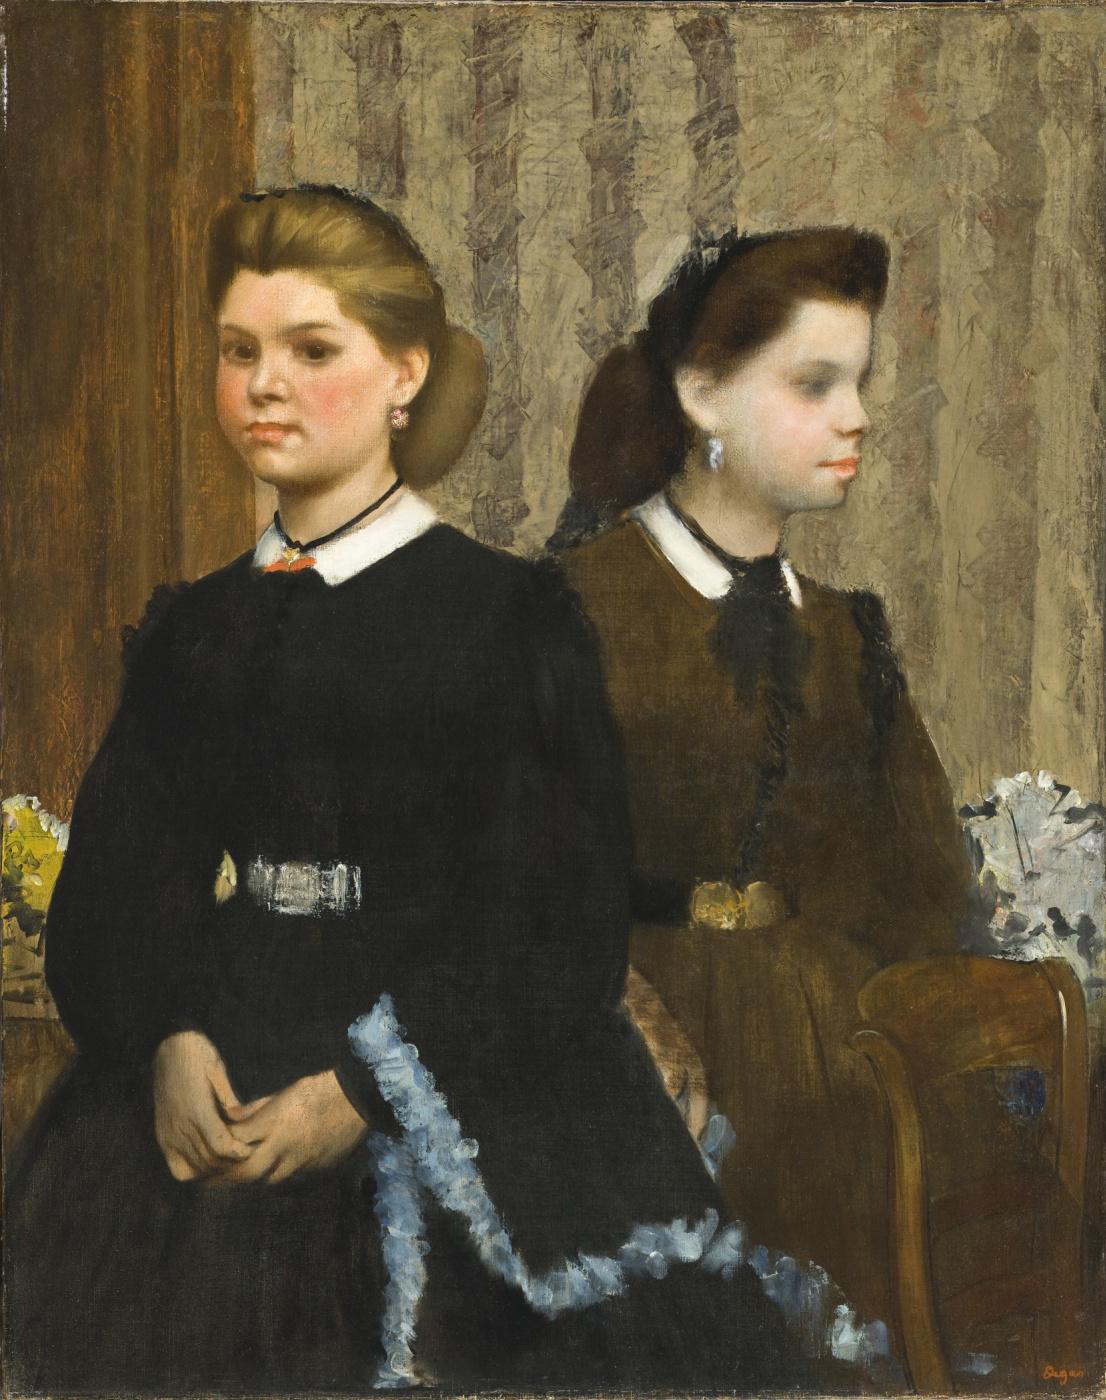 Edgar Degas. The Bellelli Sisters (Giovanna and Giuliana Bellelli)